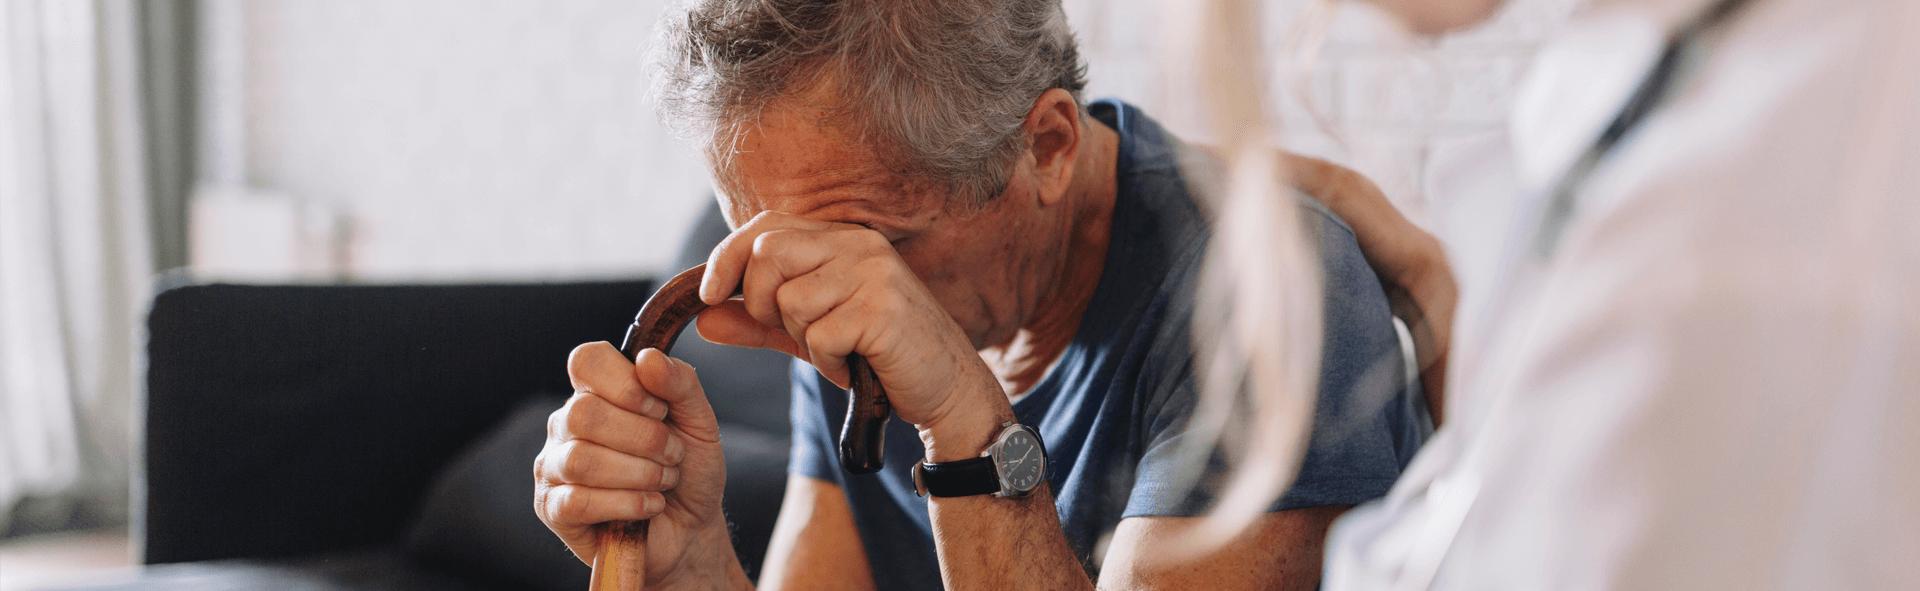 Serviços cuidadores de idosos